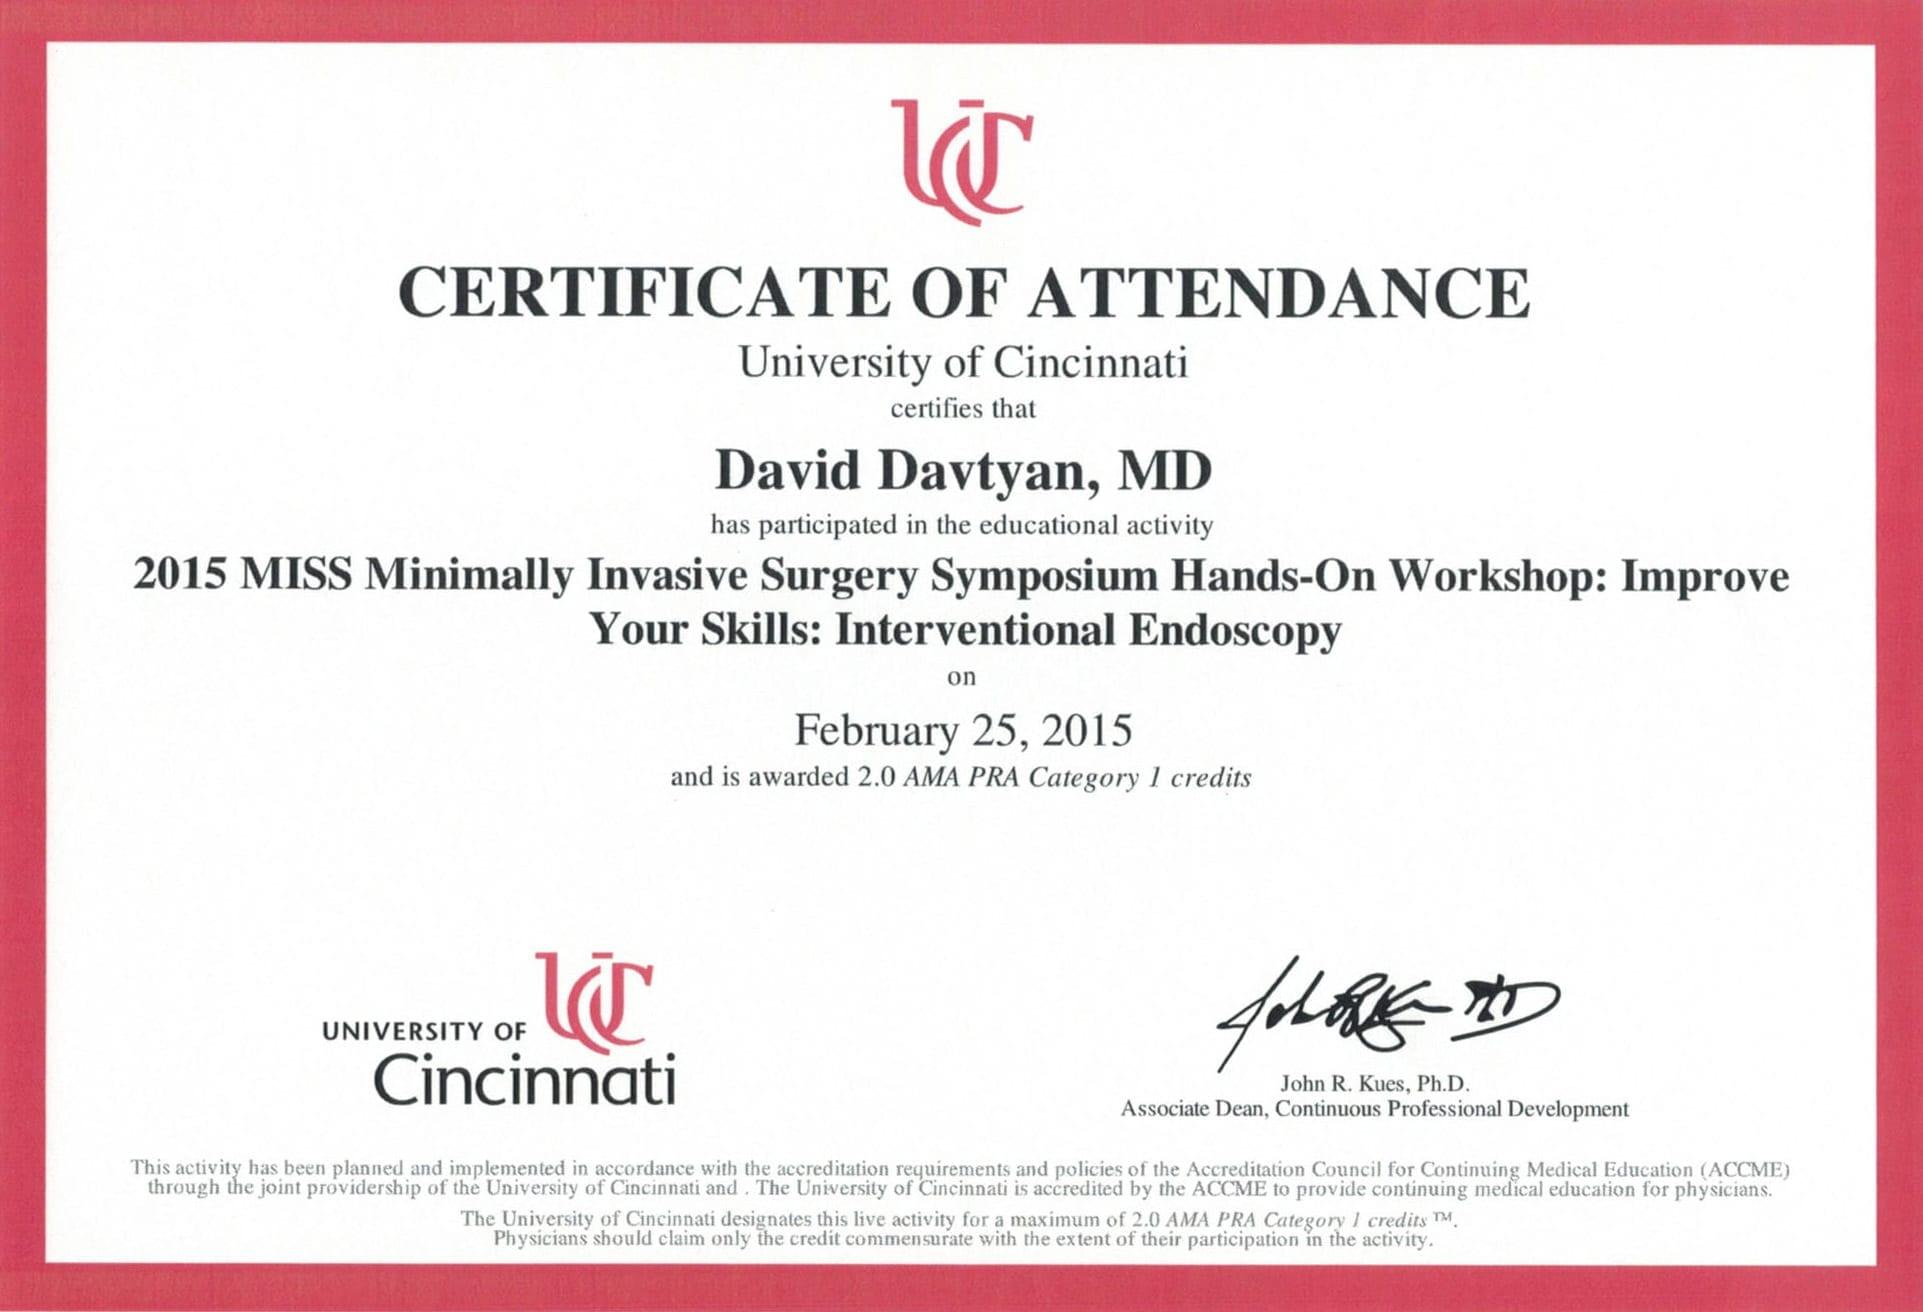 Dr. David Davtyan's 2015 University of Cincinnati MISS Minimally Invasive Surgery Symposium Certification Of Attendance